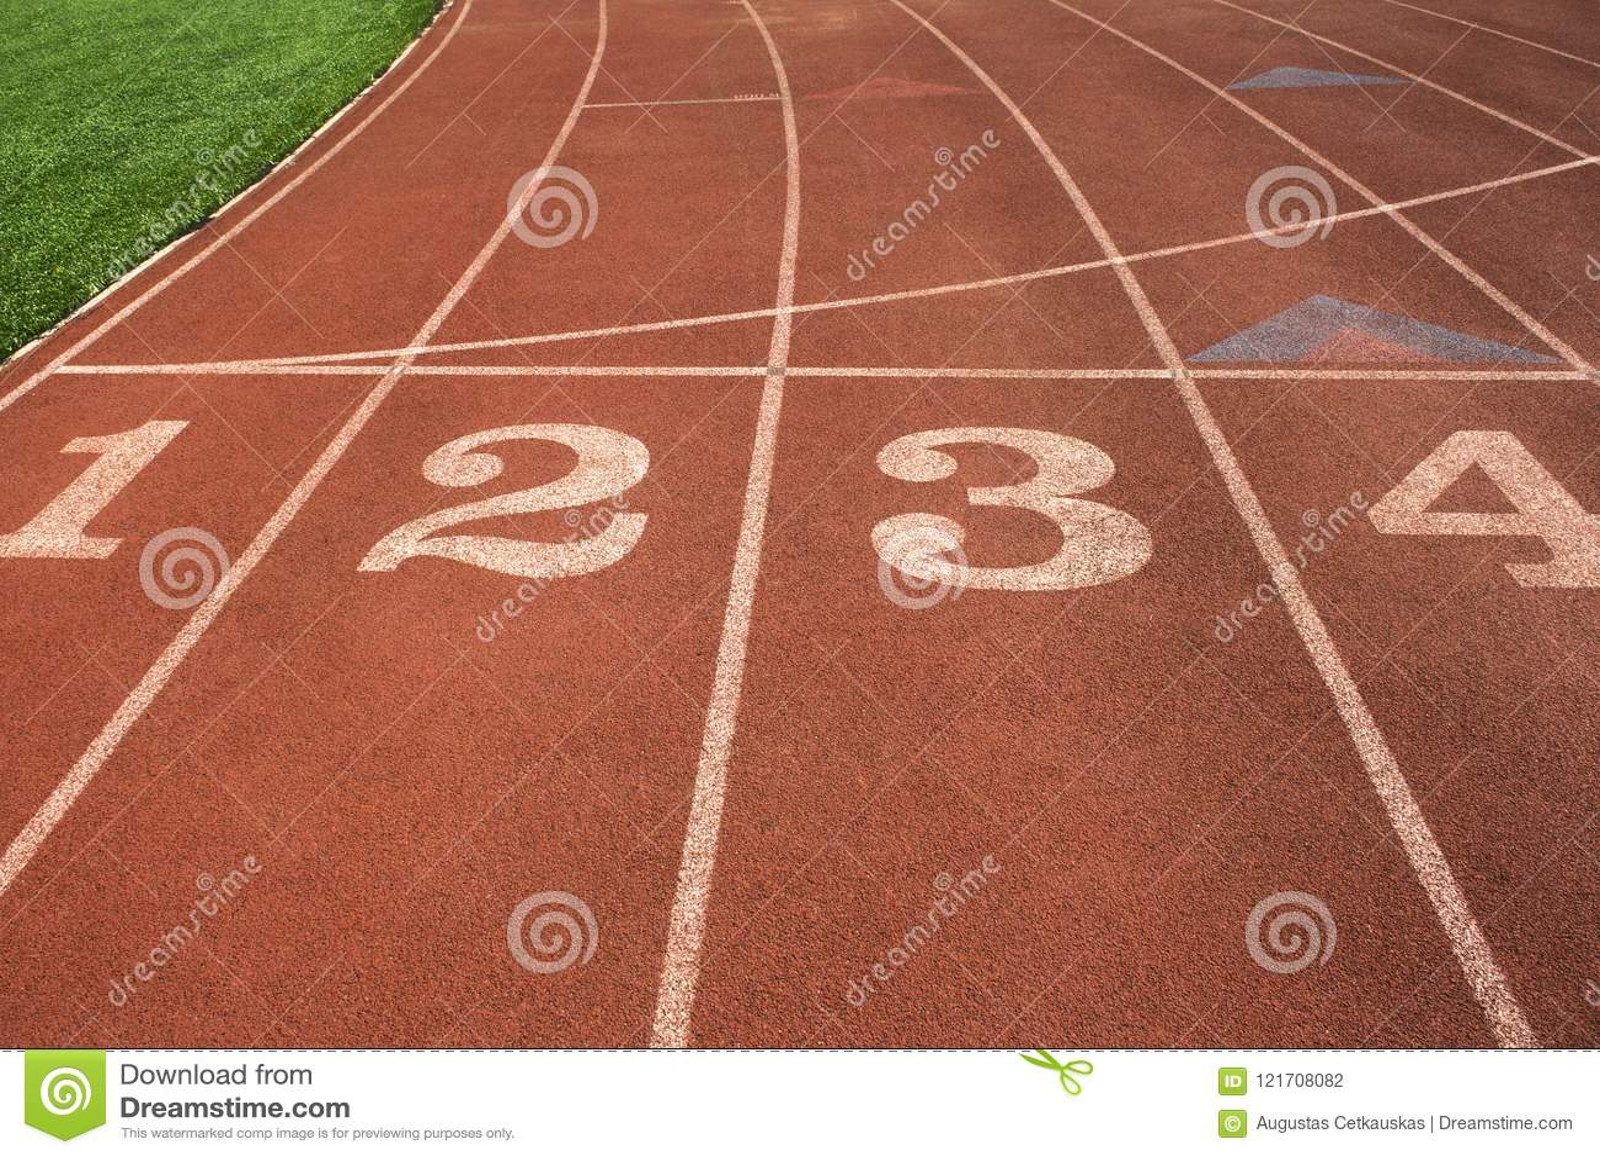 Rubber standard of athletics stadium running track